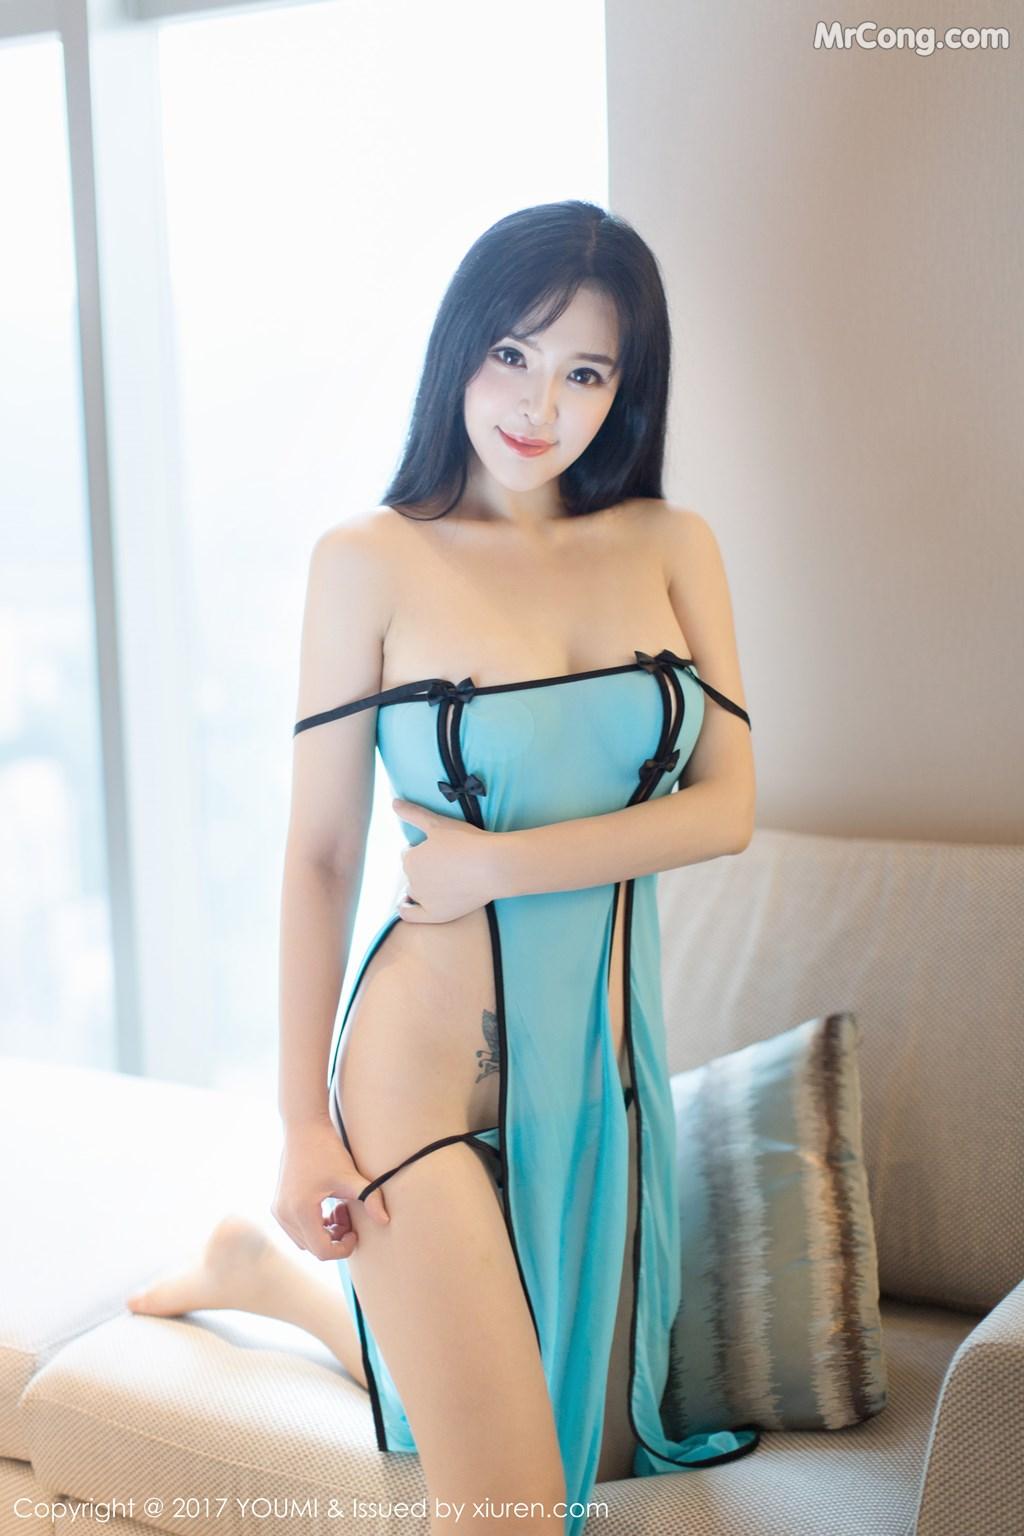 YouMi Vol.070: Model Liu Yu Er (刘 钰 儿) (45 pictures)